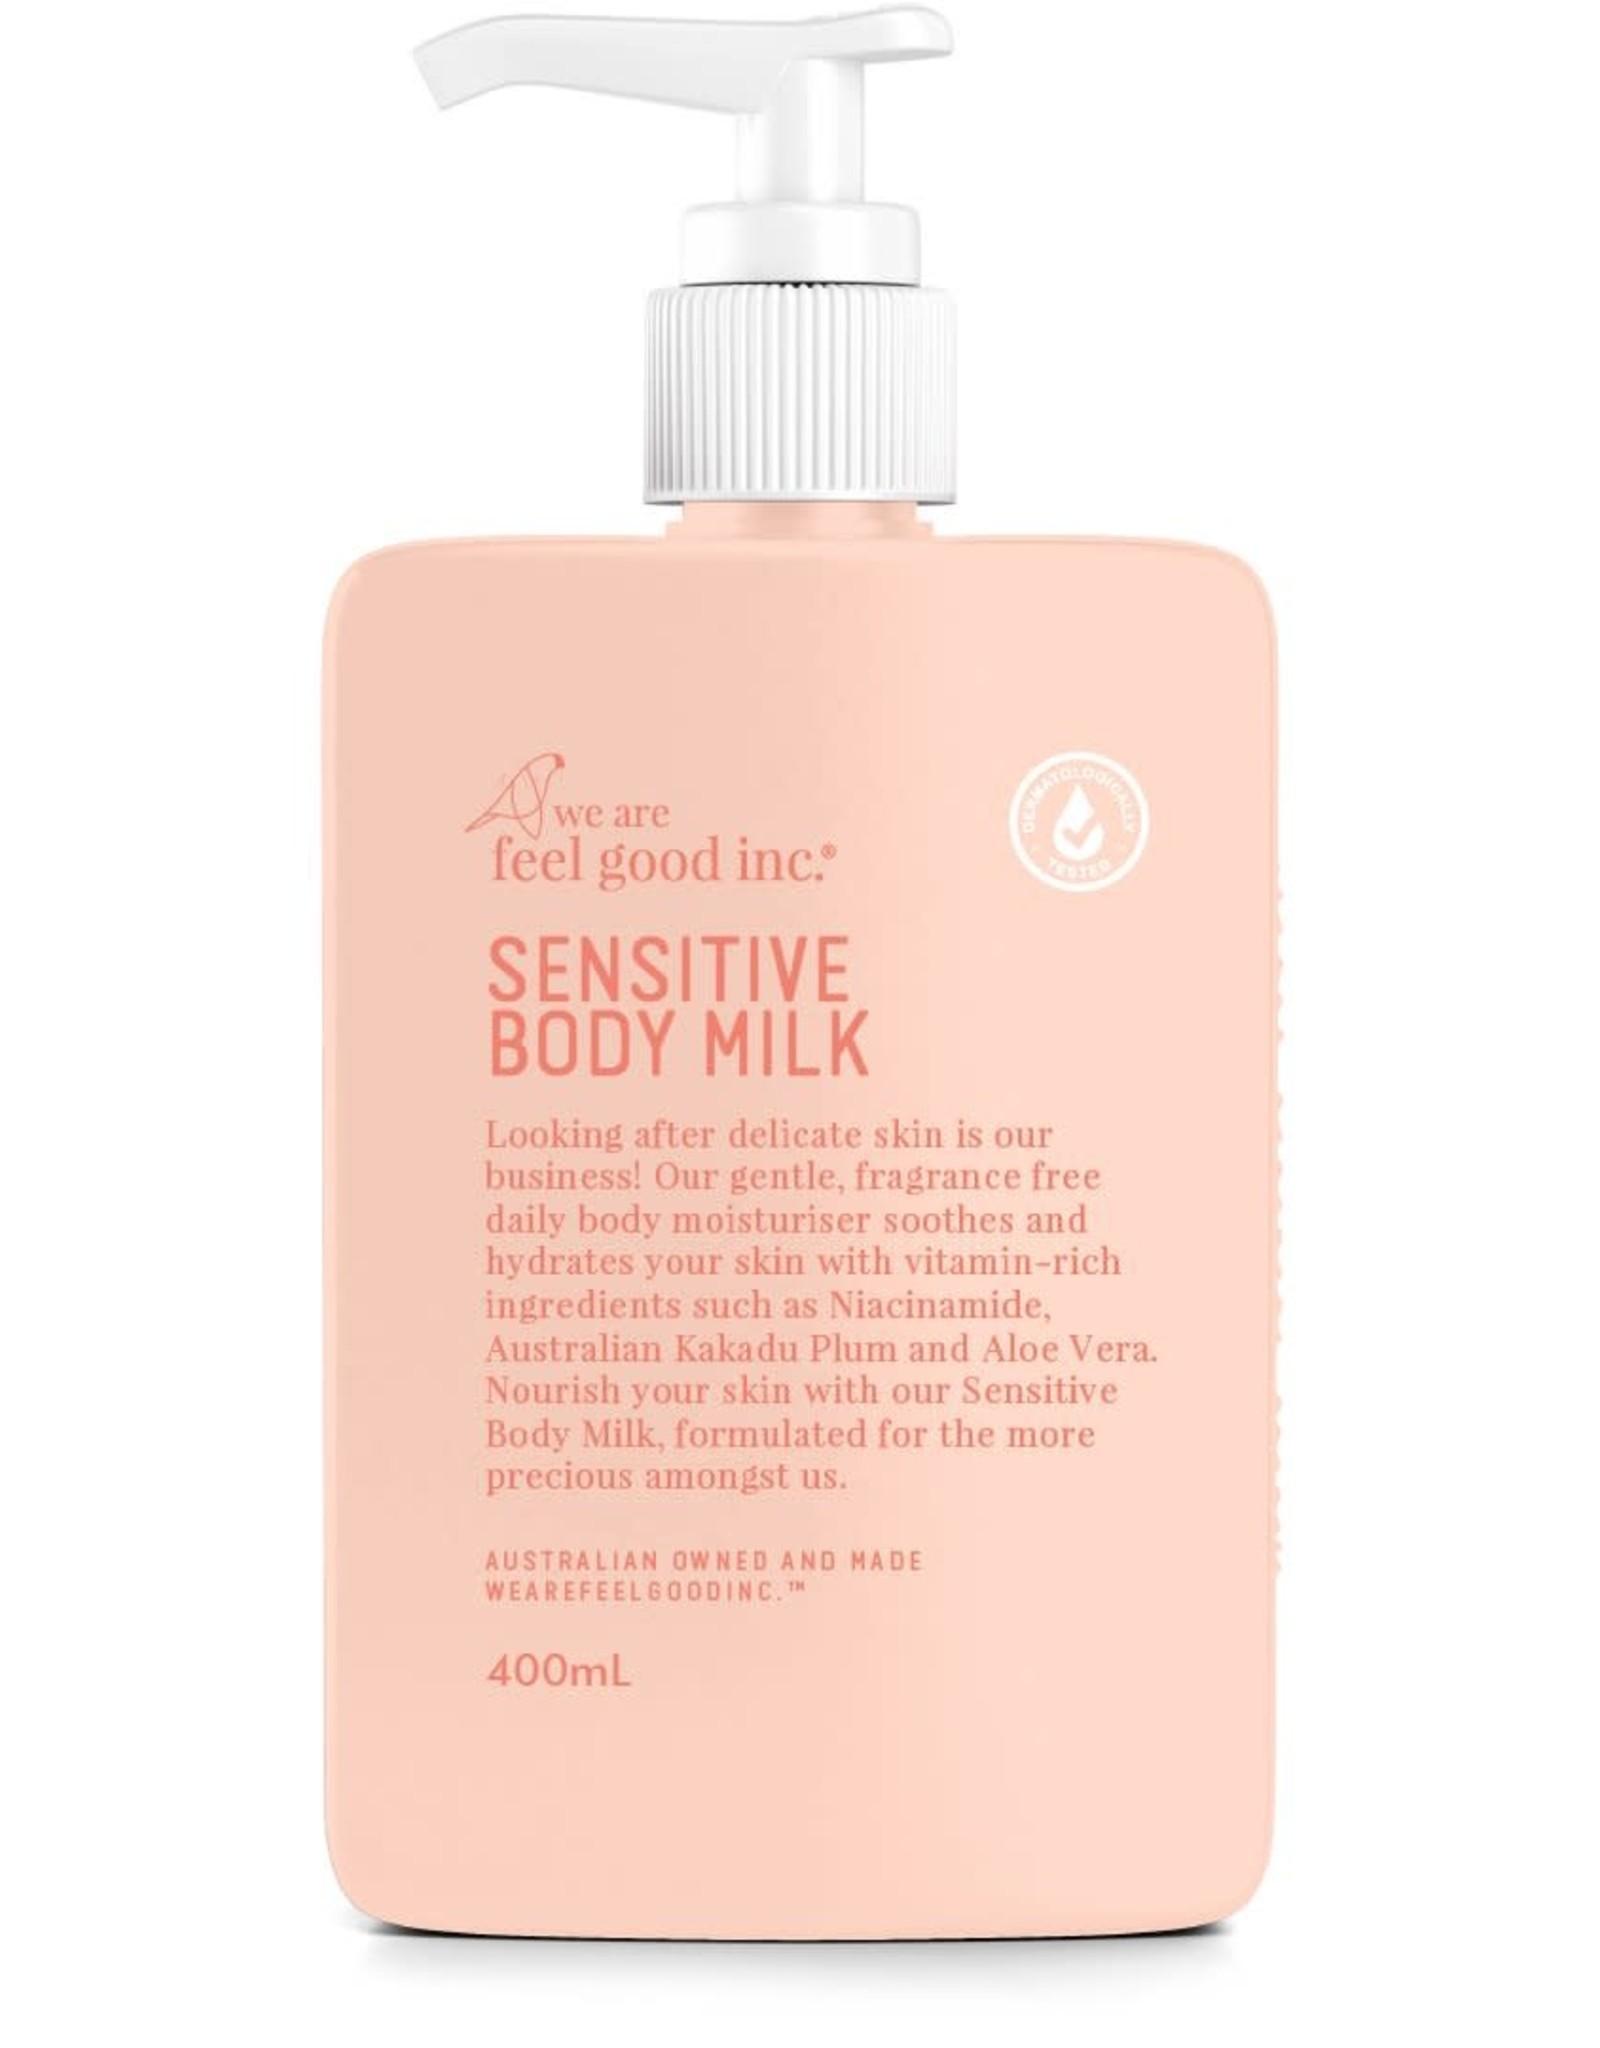 WE ARE FEEL GOOD INC Sensitive Body Milk 400ml